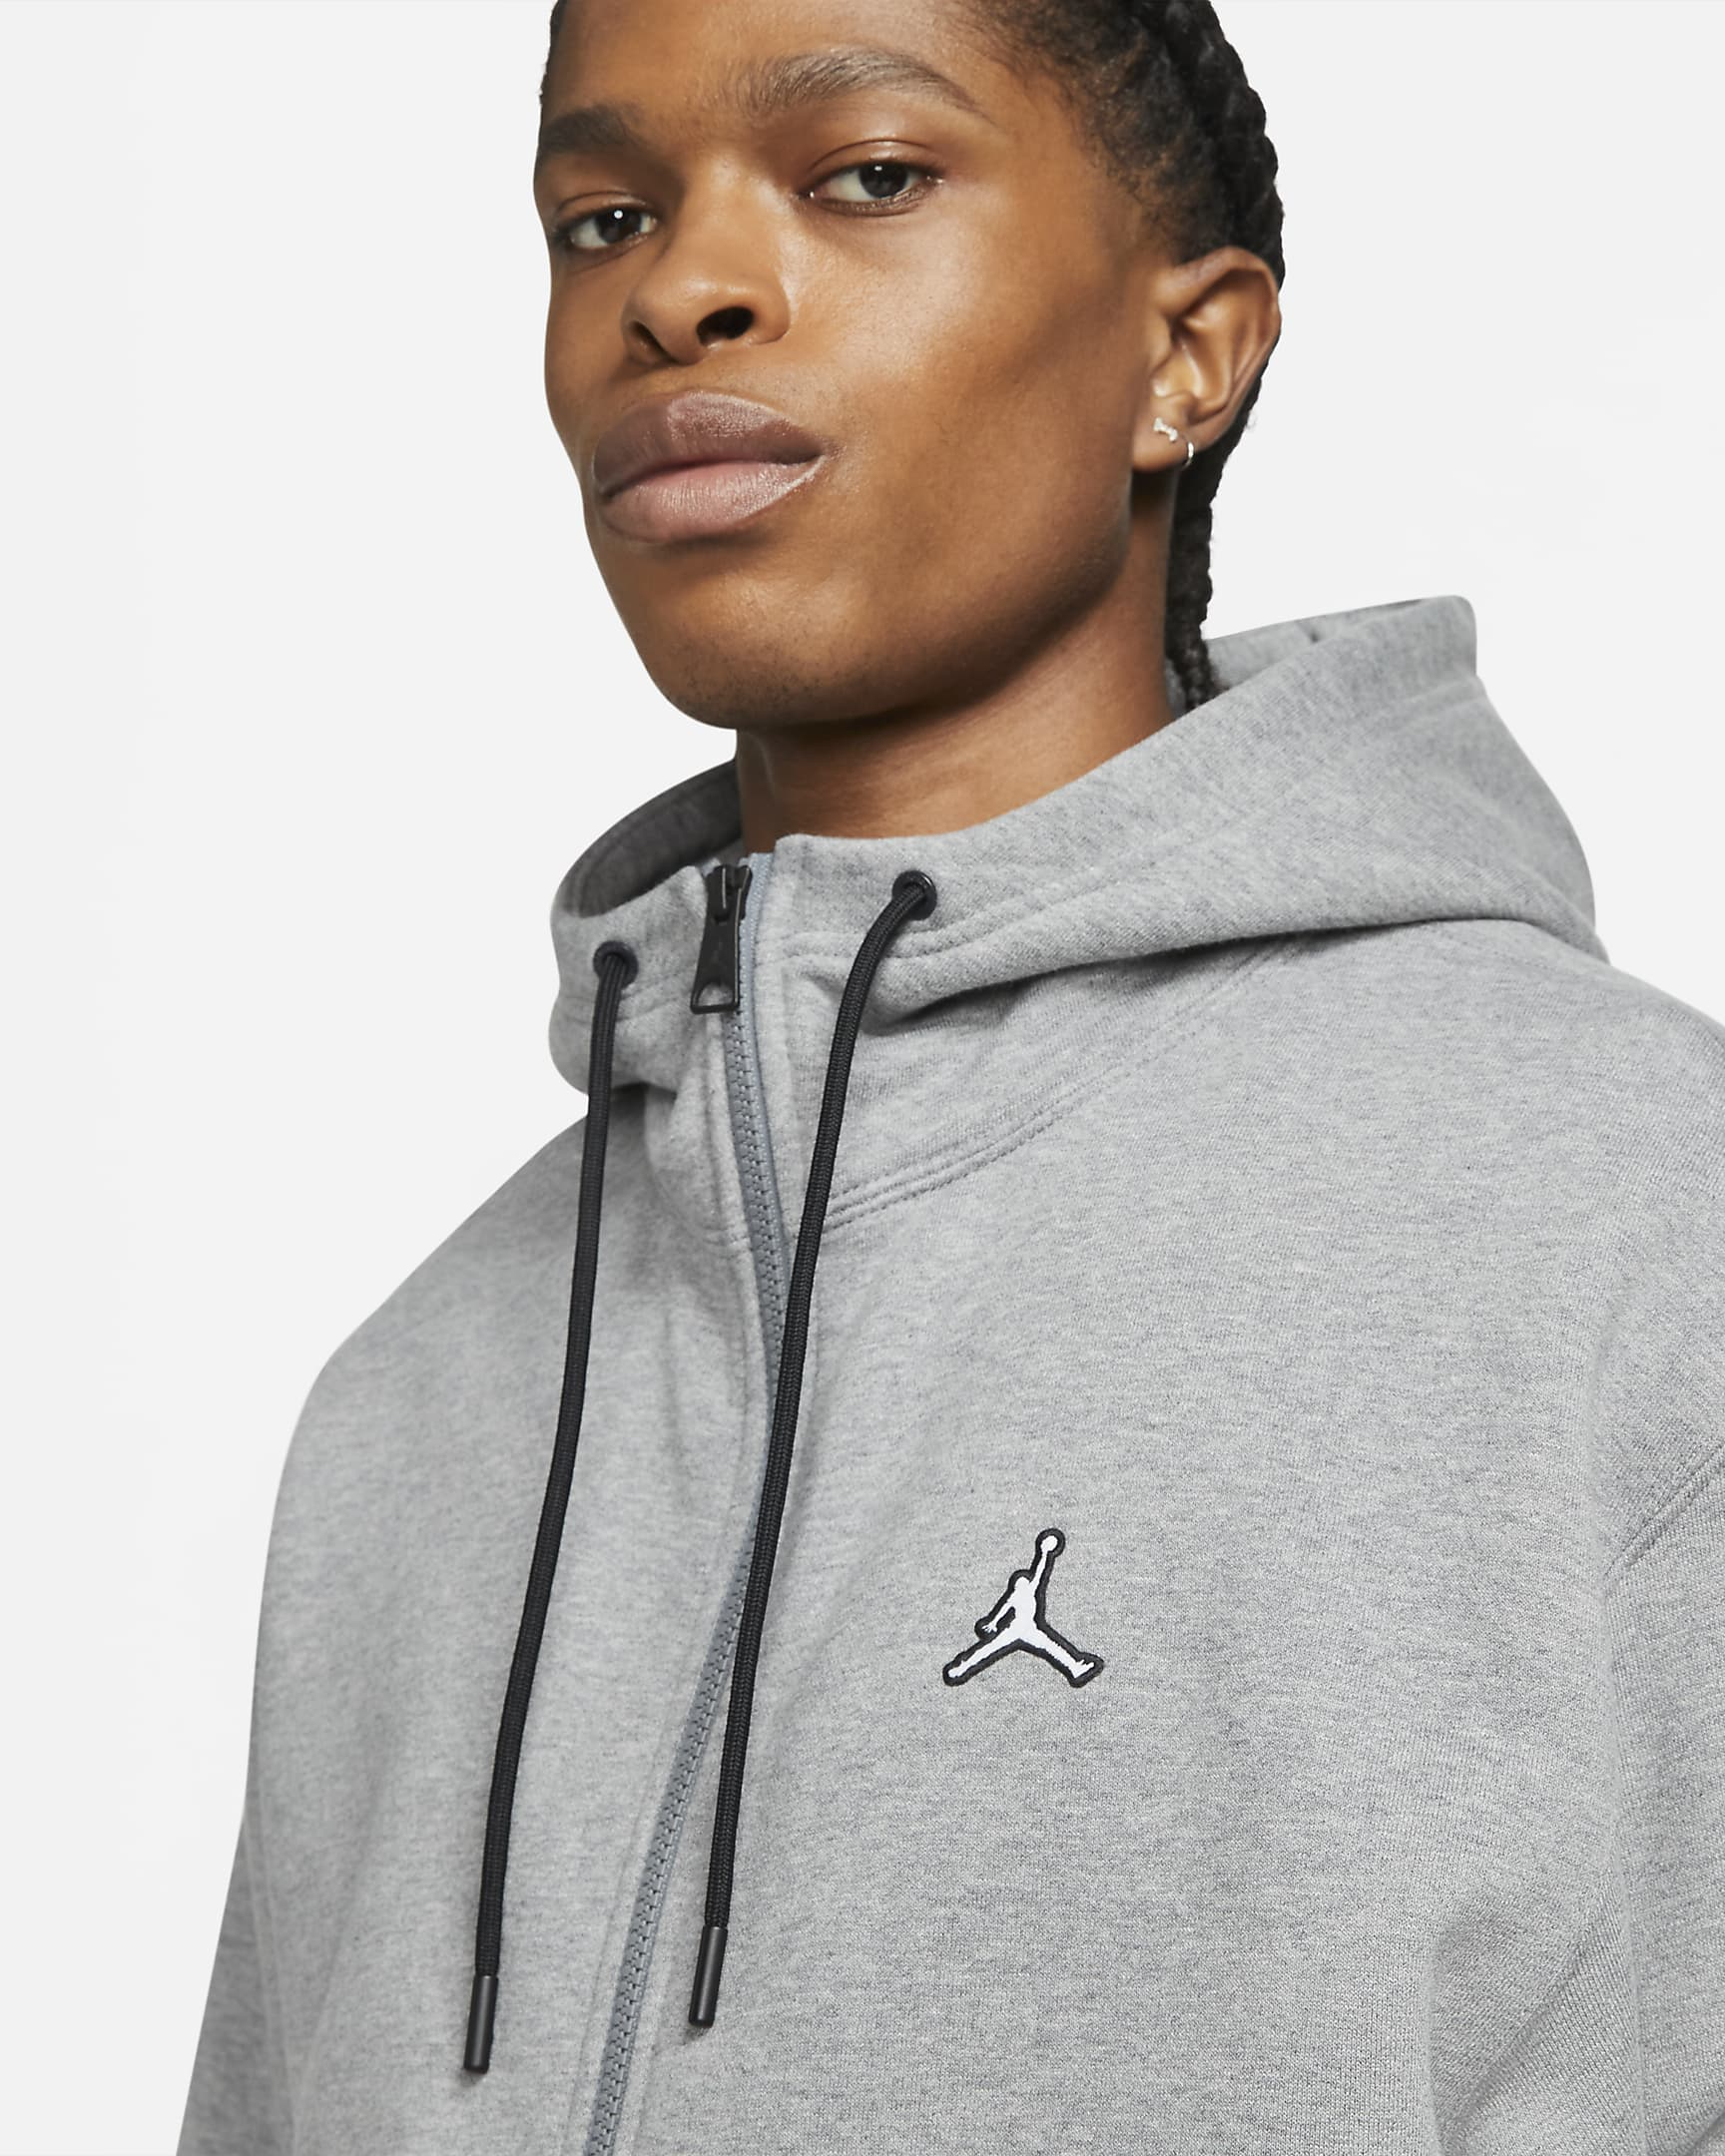 jordan-essentials-mens-fleece-full-zip-hoodie-DKJfG9-1.png